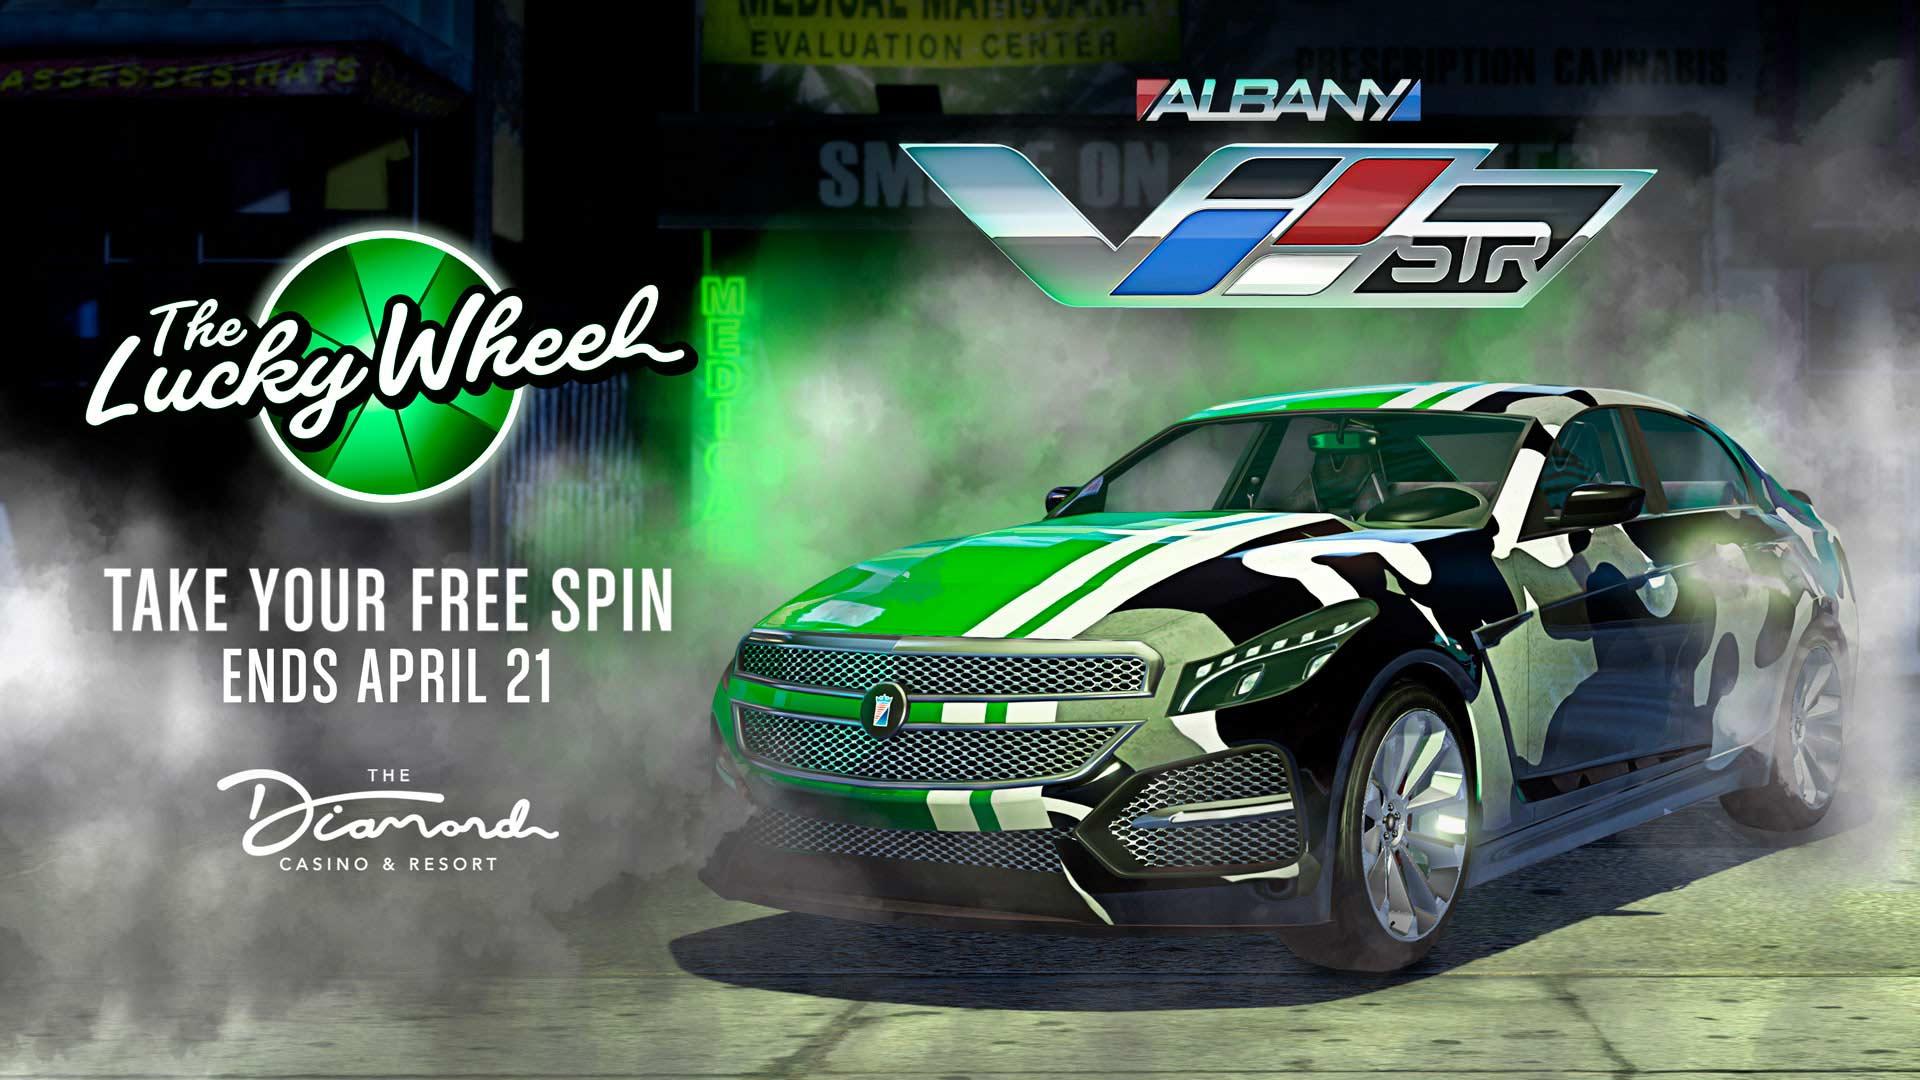 GTA Online - Albany V-STR